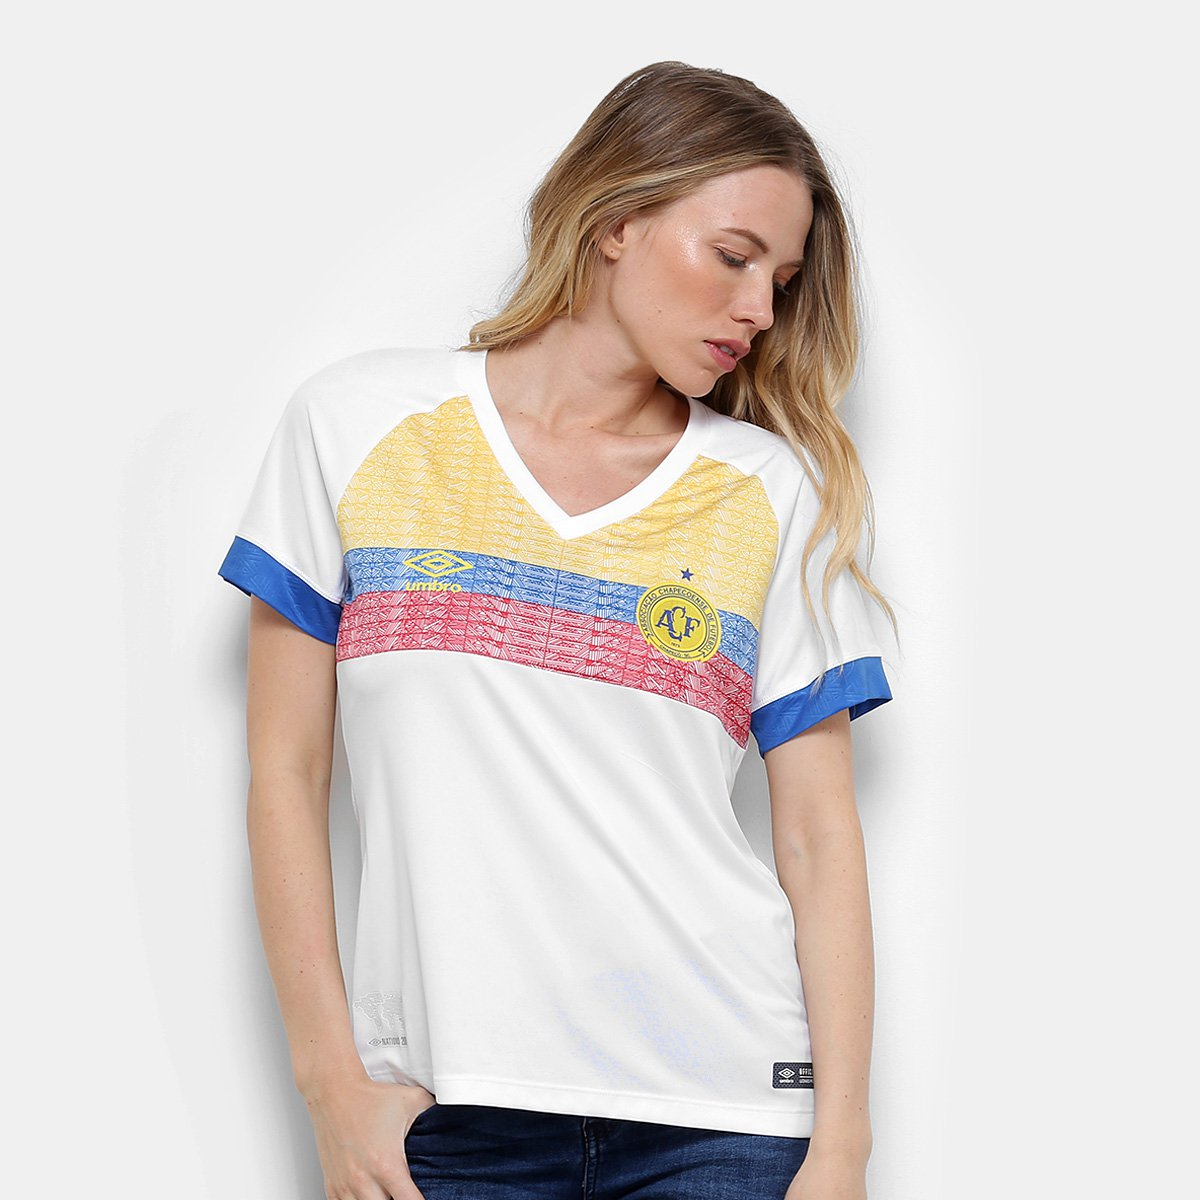 2018 s Feminina II Chapecoense Umbro Azul Pasion Branco e Camisa La n° Torcedor qEtacng1